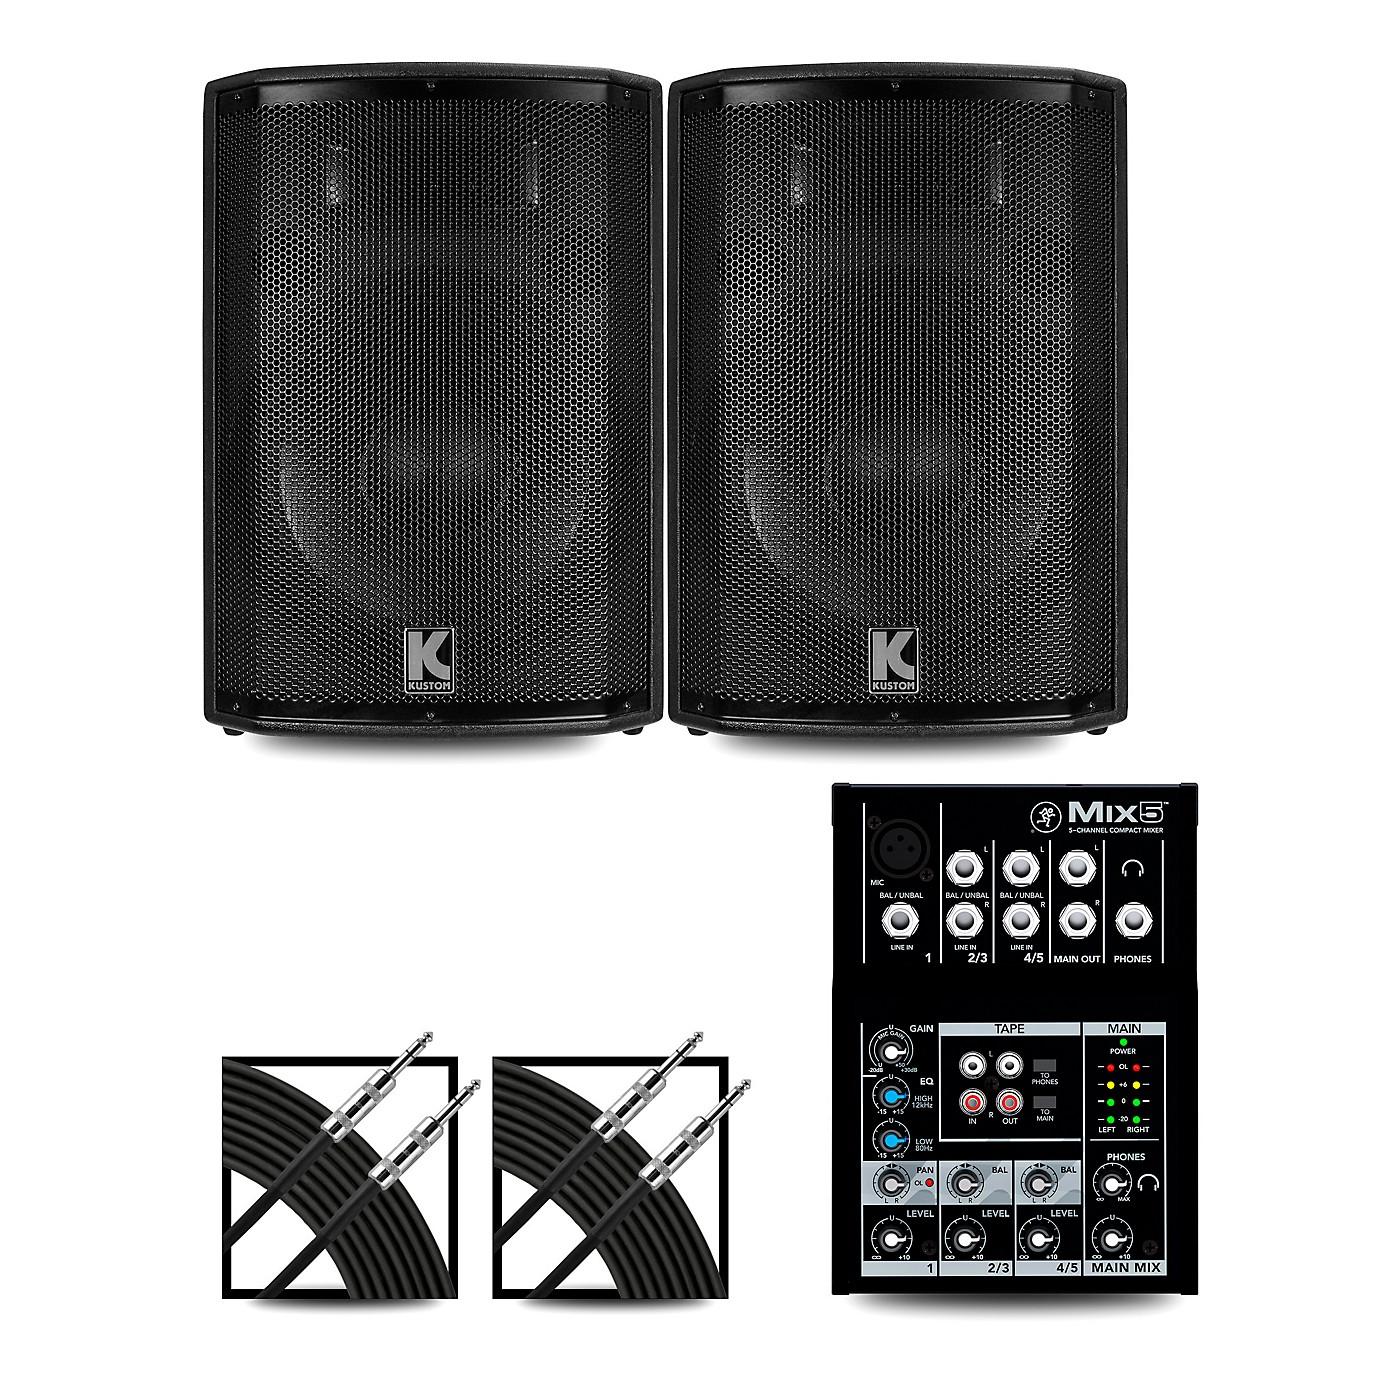 Mackie Mix5 Mixer and Kustom HiPAC Speakers thumbnail